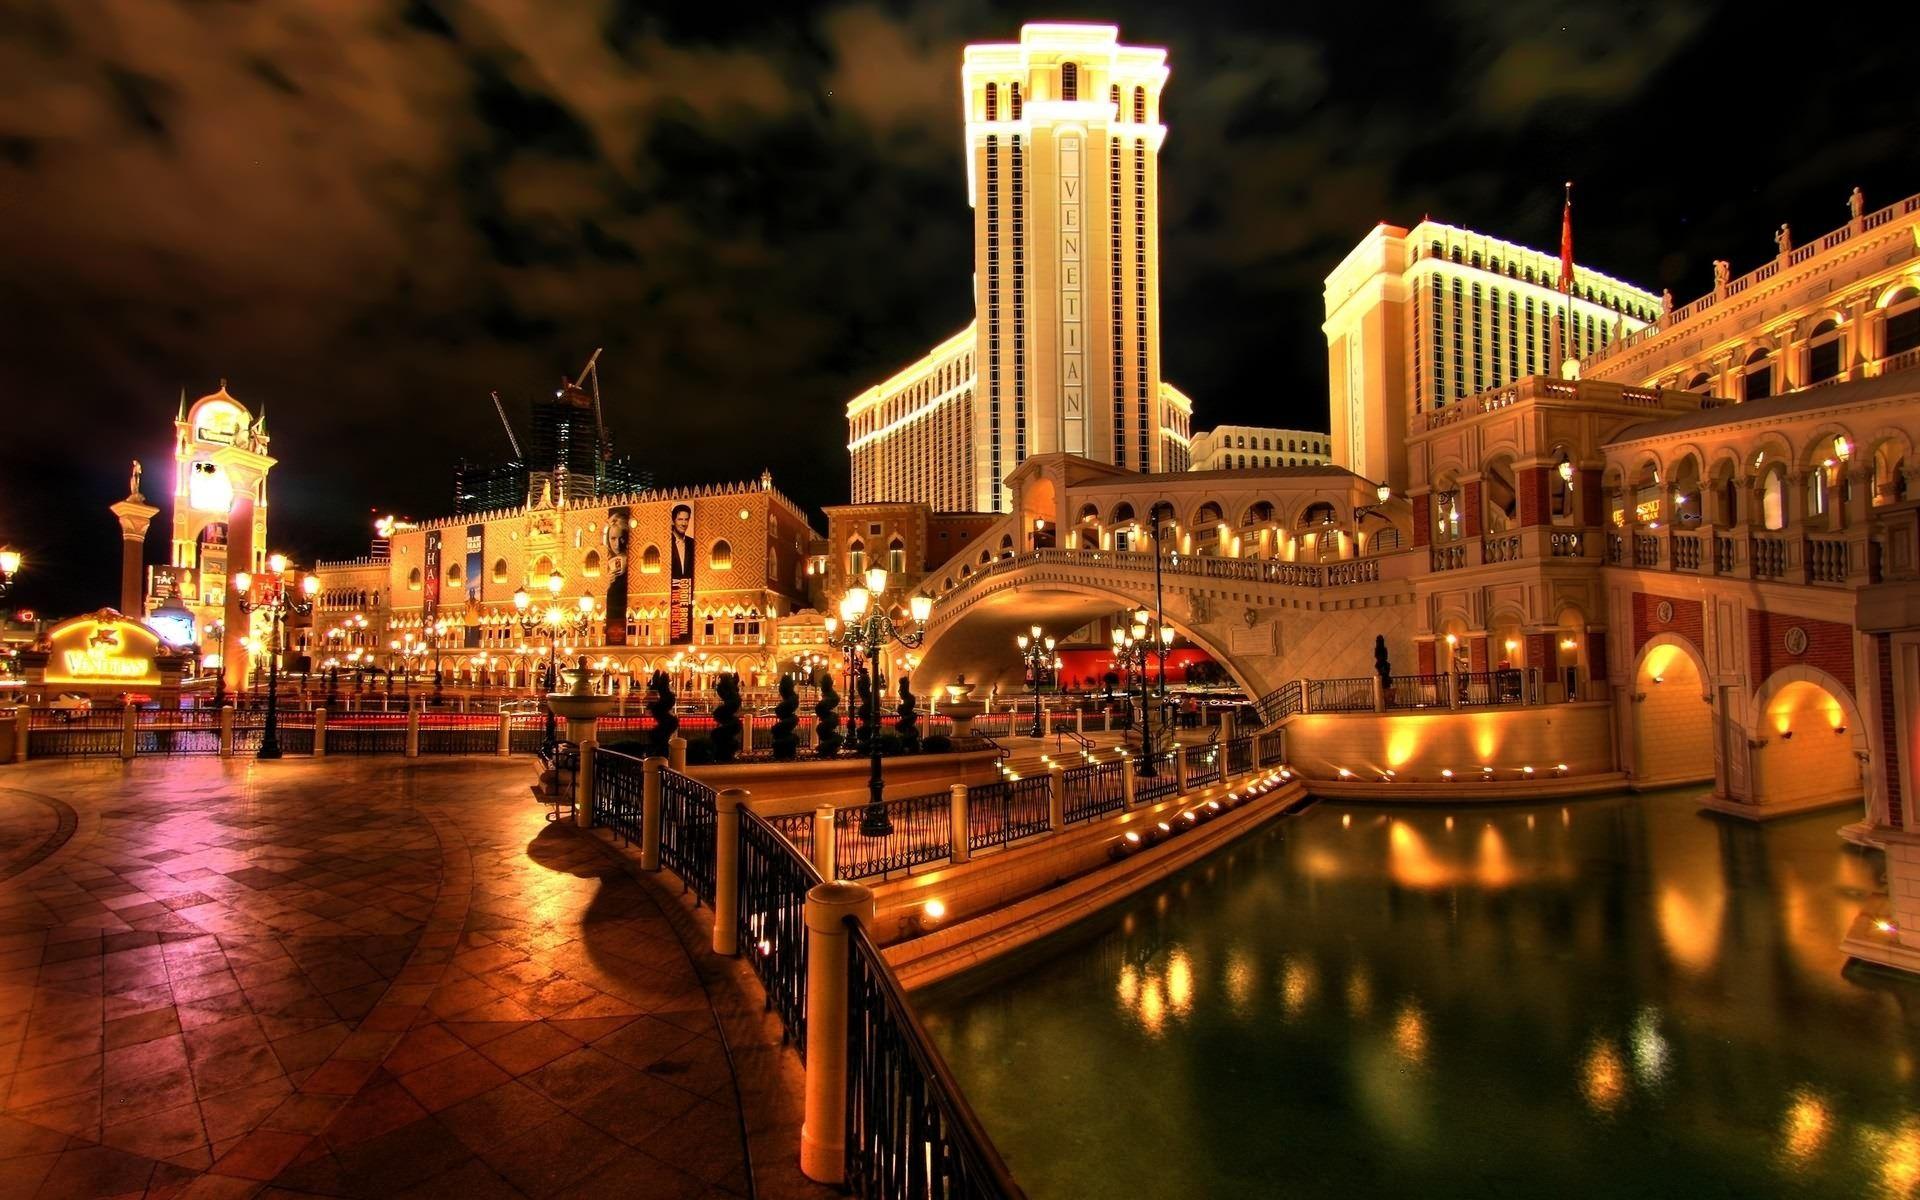 Casino Venetian Italy - Casino Venetian Italy